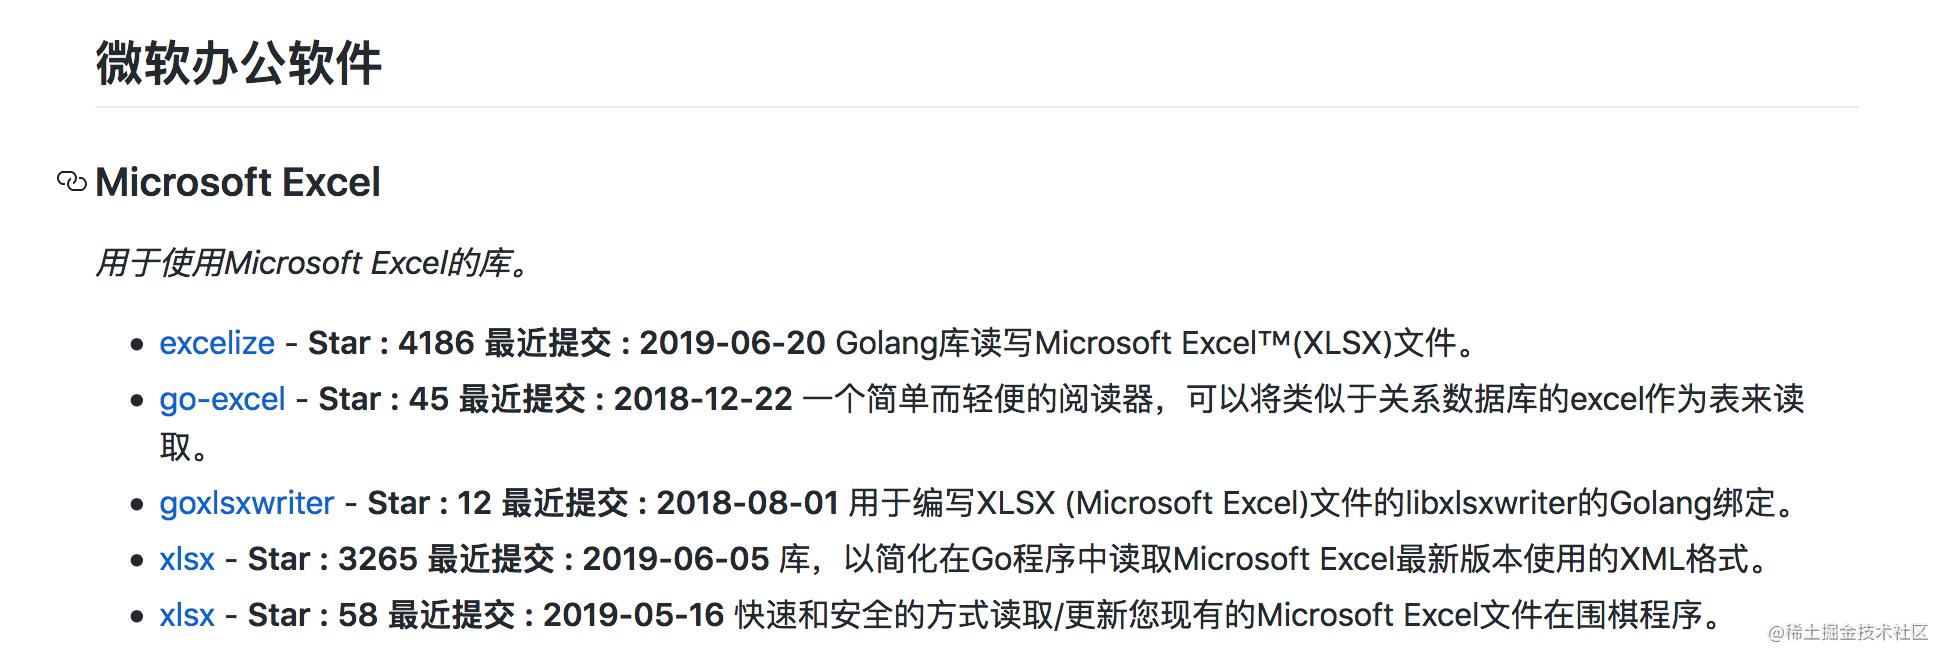 Awesome-go微软办公软件翻译部分,包含了项目的star/最近更新时间